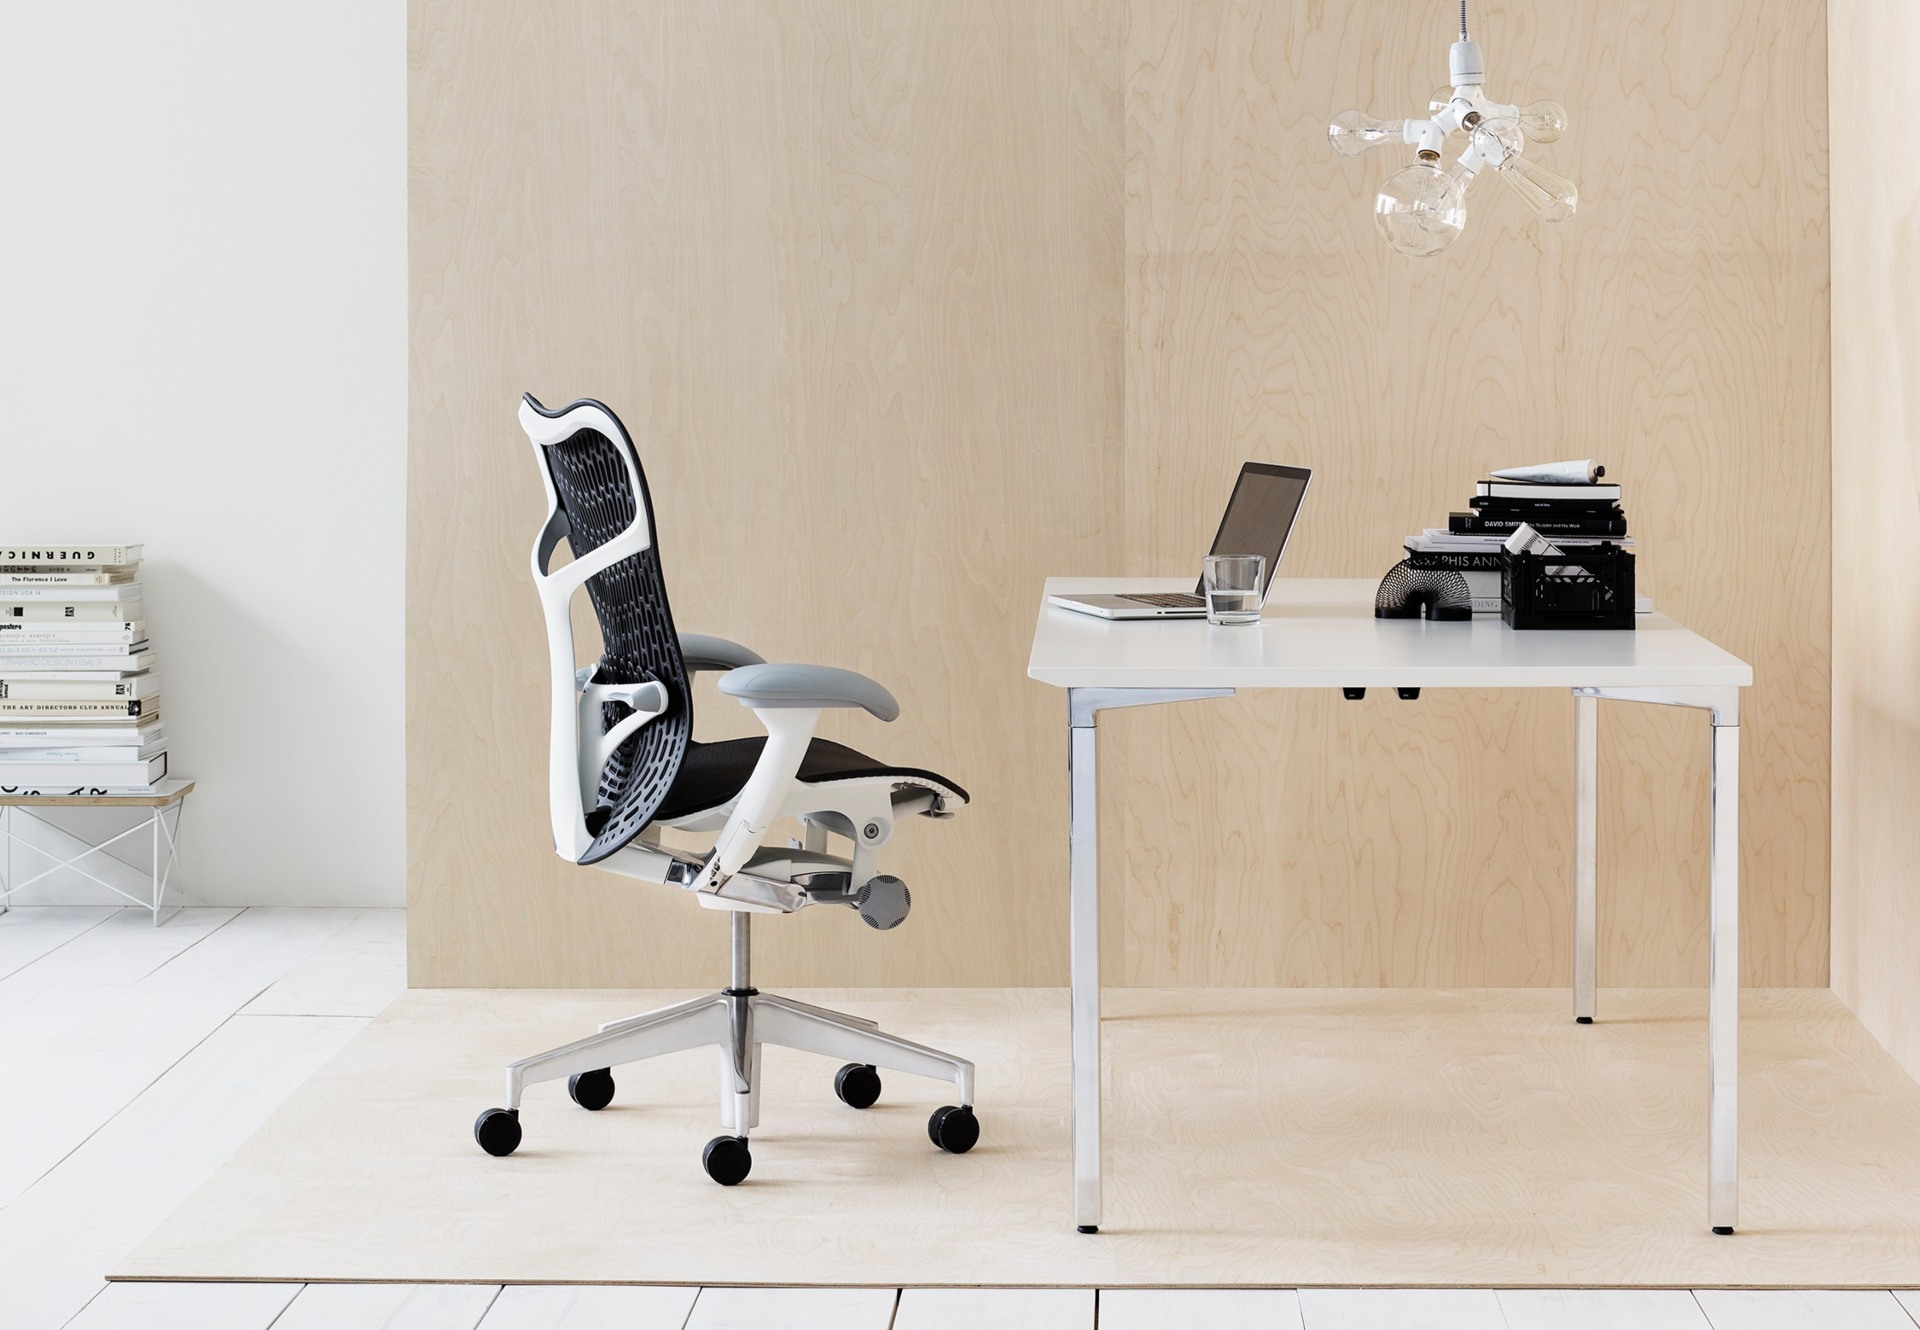 sillas ergonomicas para oficina barcelona